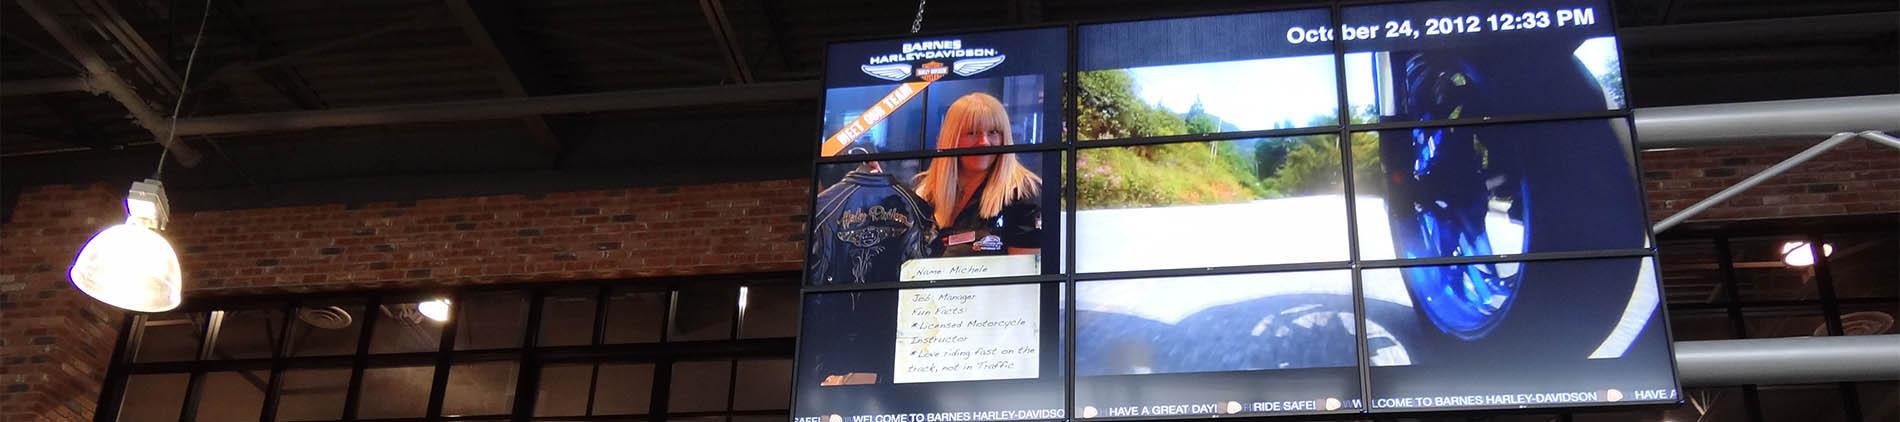 Commercial, 9UP, Display, Harley, Davidson